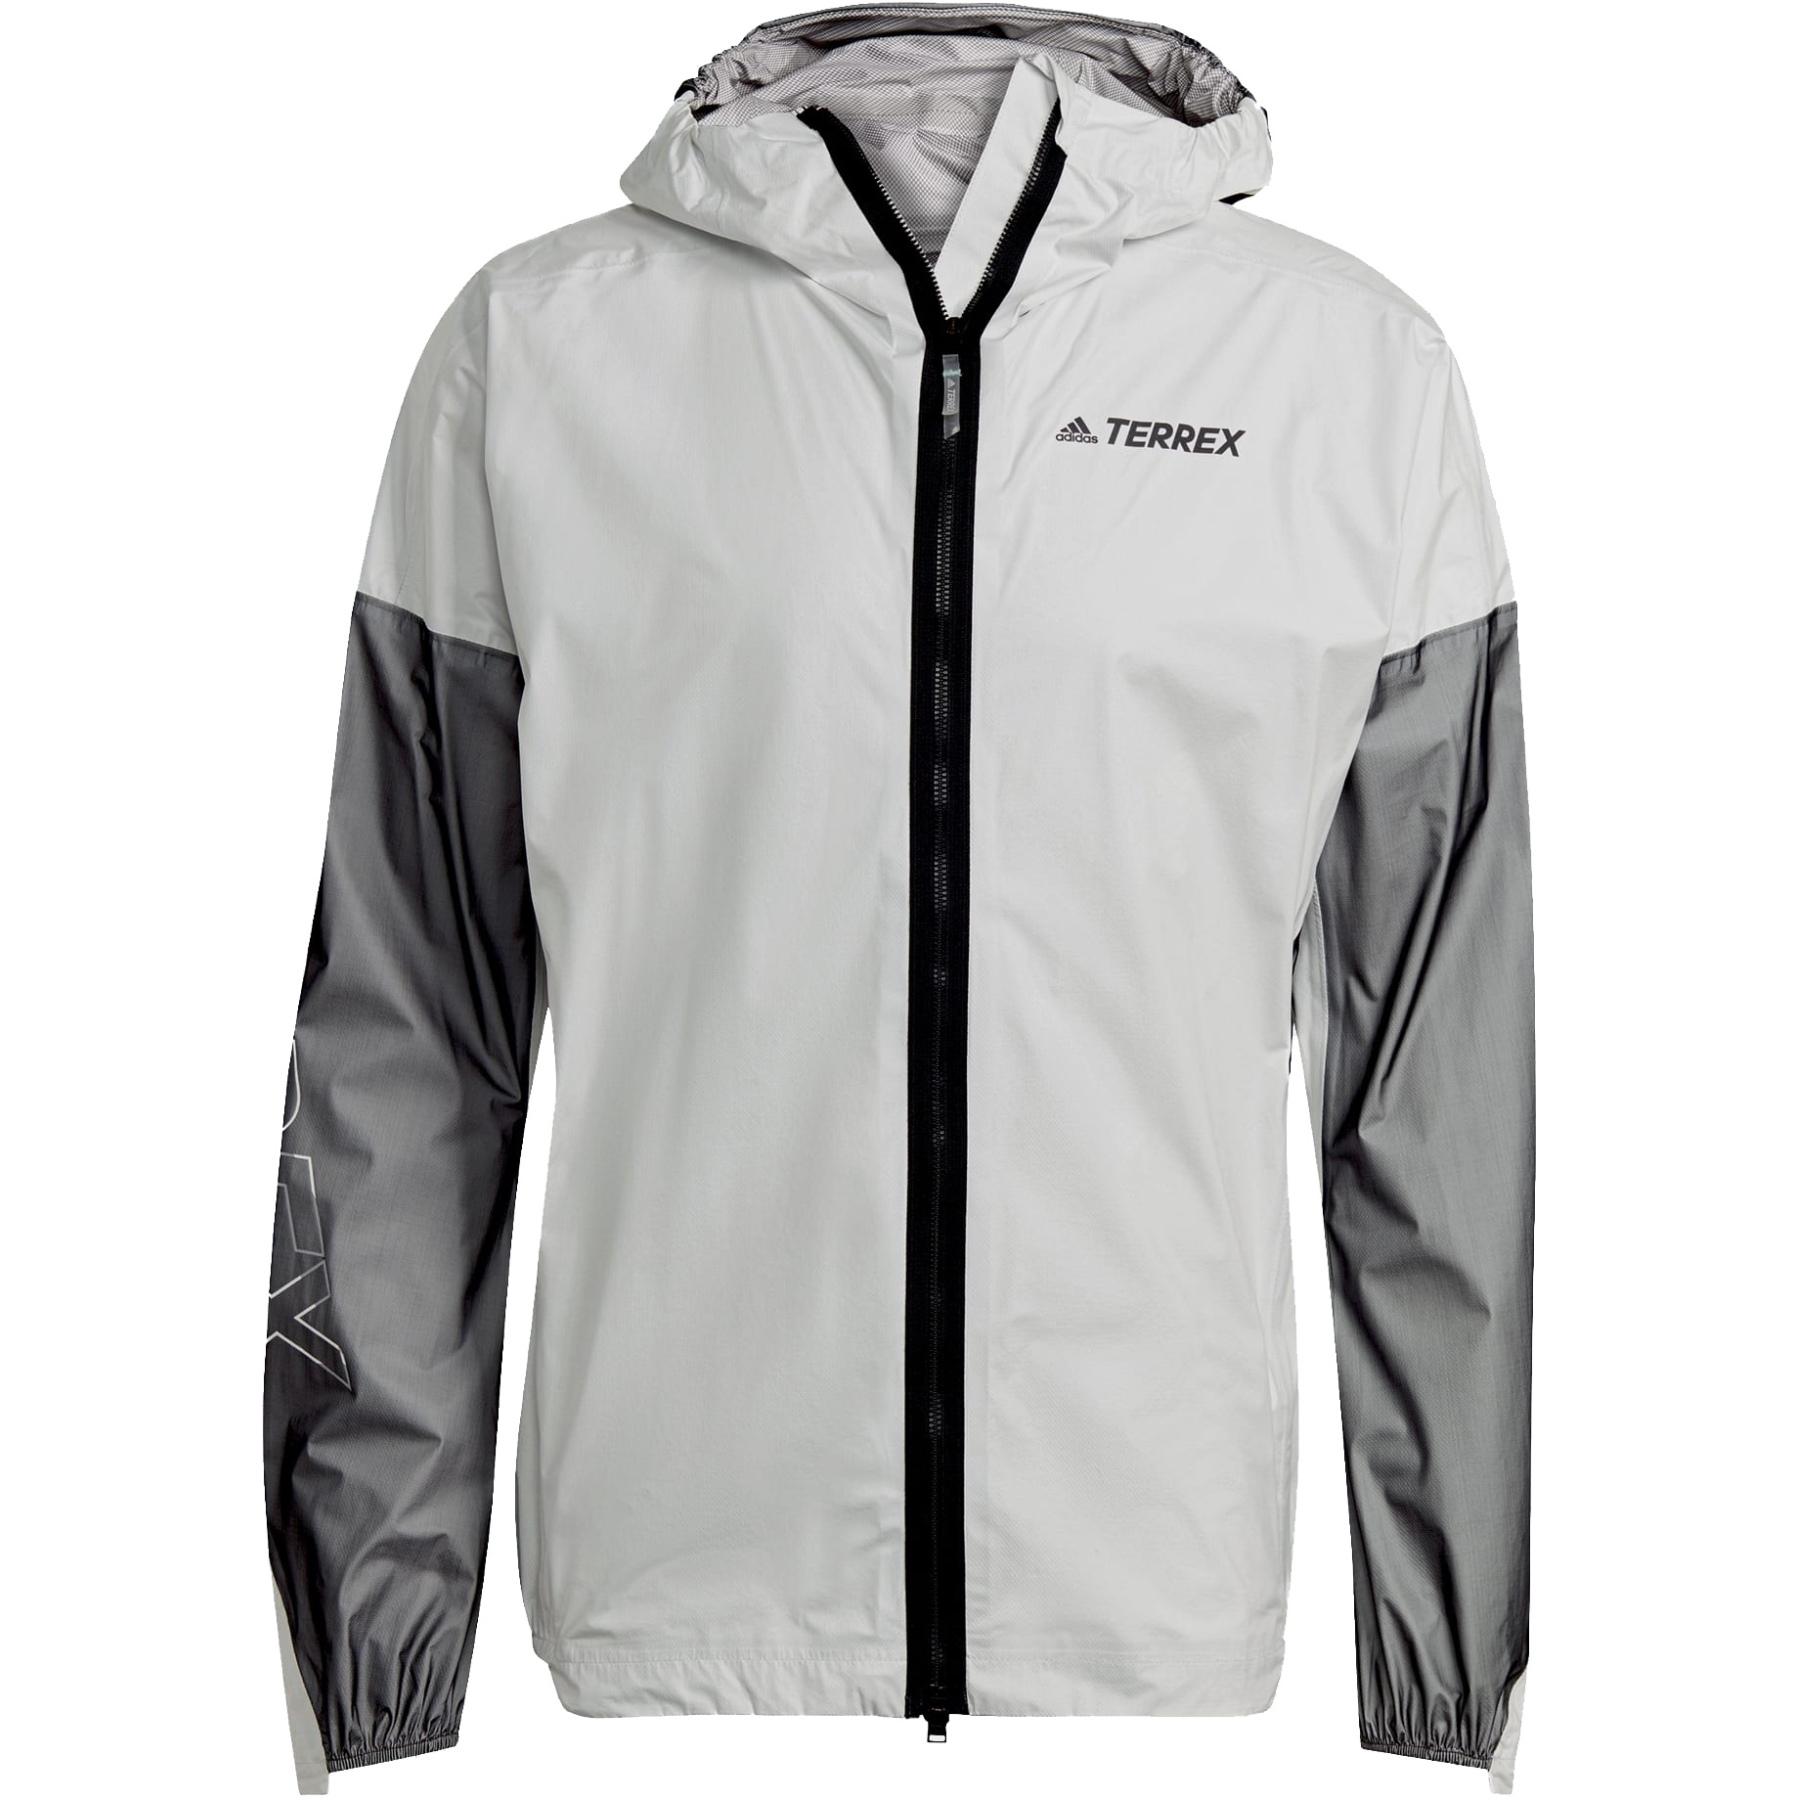 adidas Men's TERREX Agravic Pro Trail Running Rain Jacket - white/black GP3324